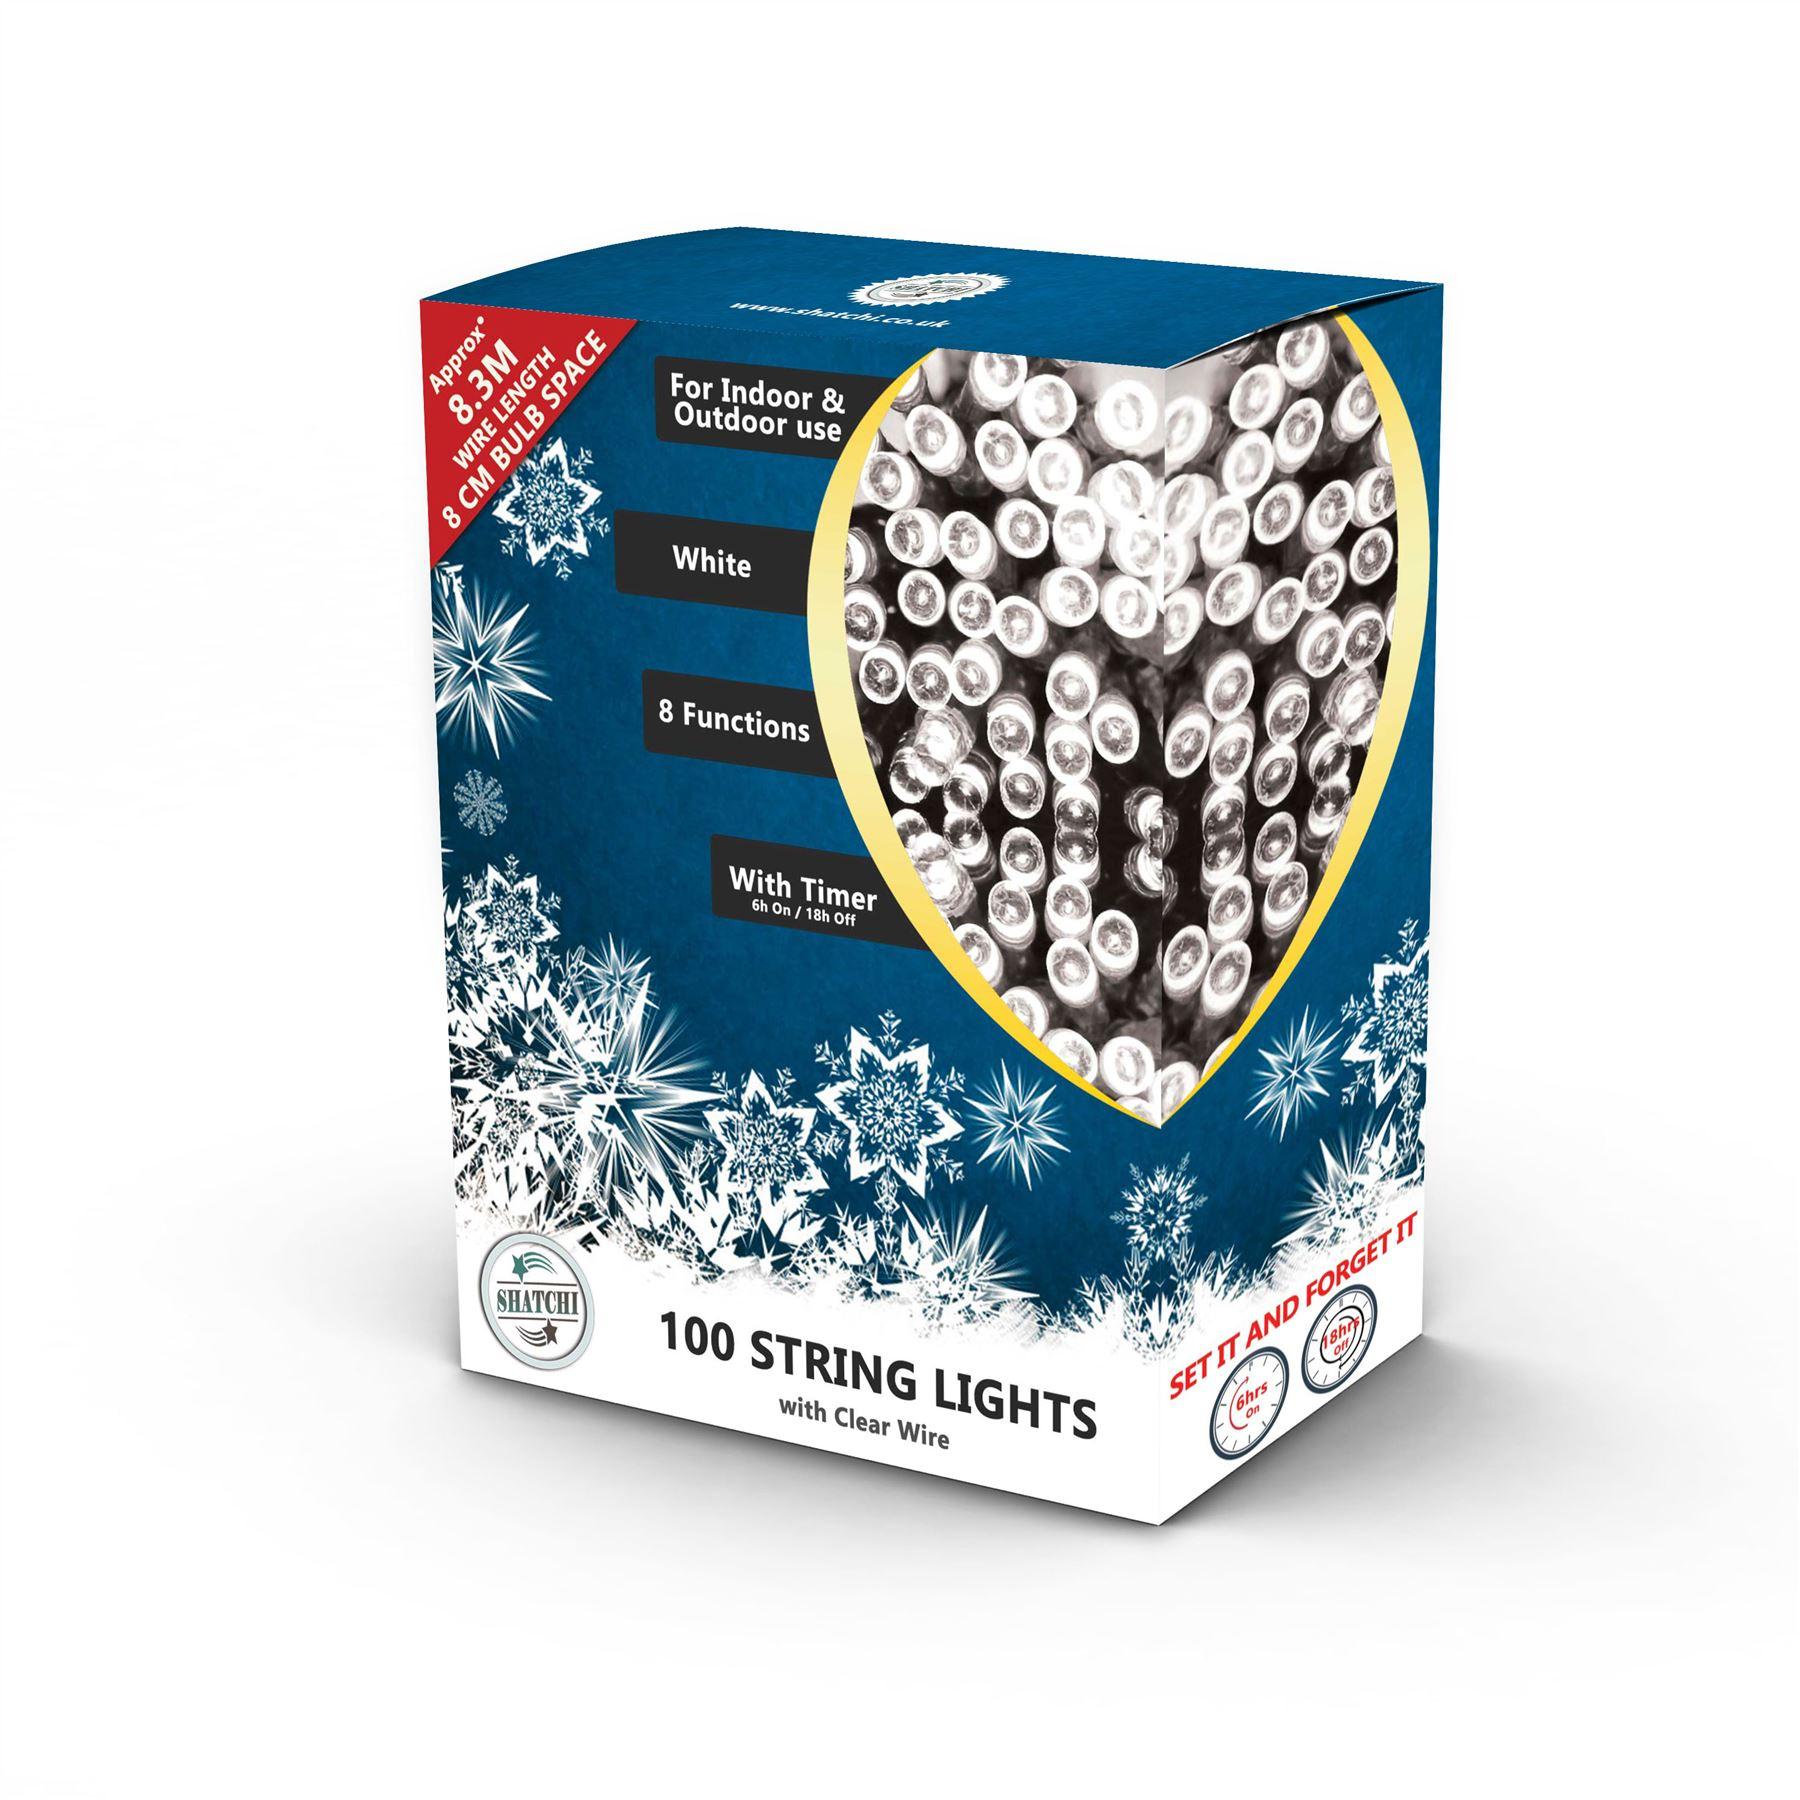 100-200-300-400-500-LED-Christmas-String-Fairy-Lights-Xmas-Decorations-Tree miniature 15